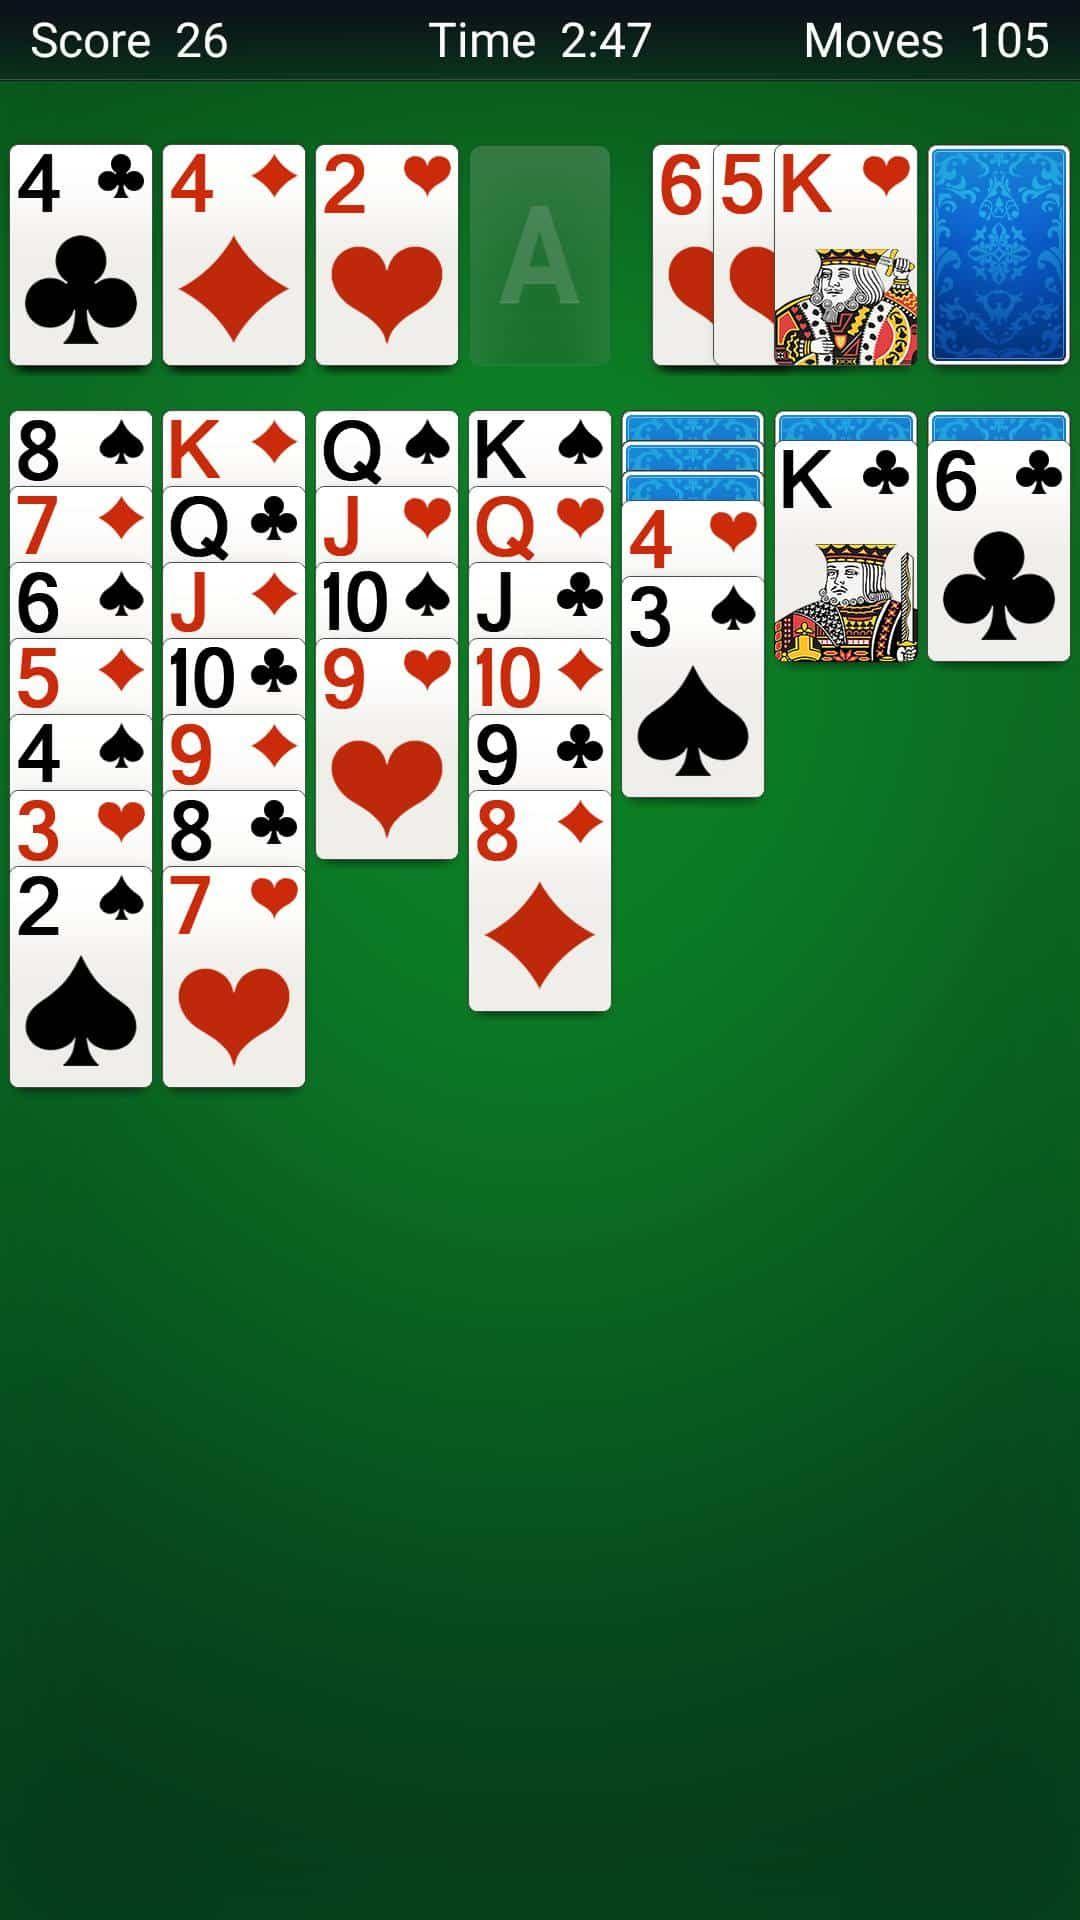 patience card games Best board gamdes 2020 in 2020